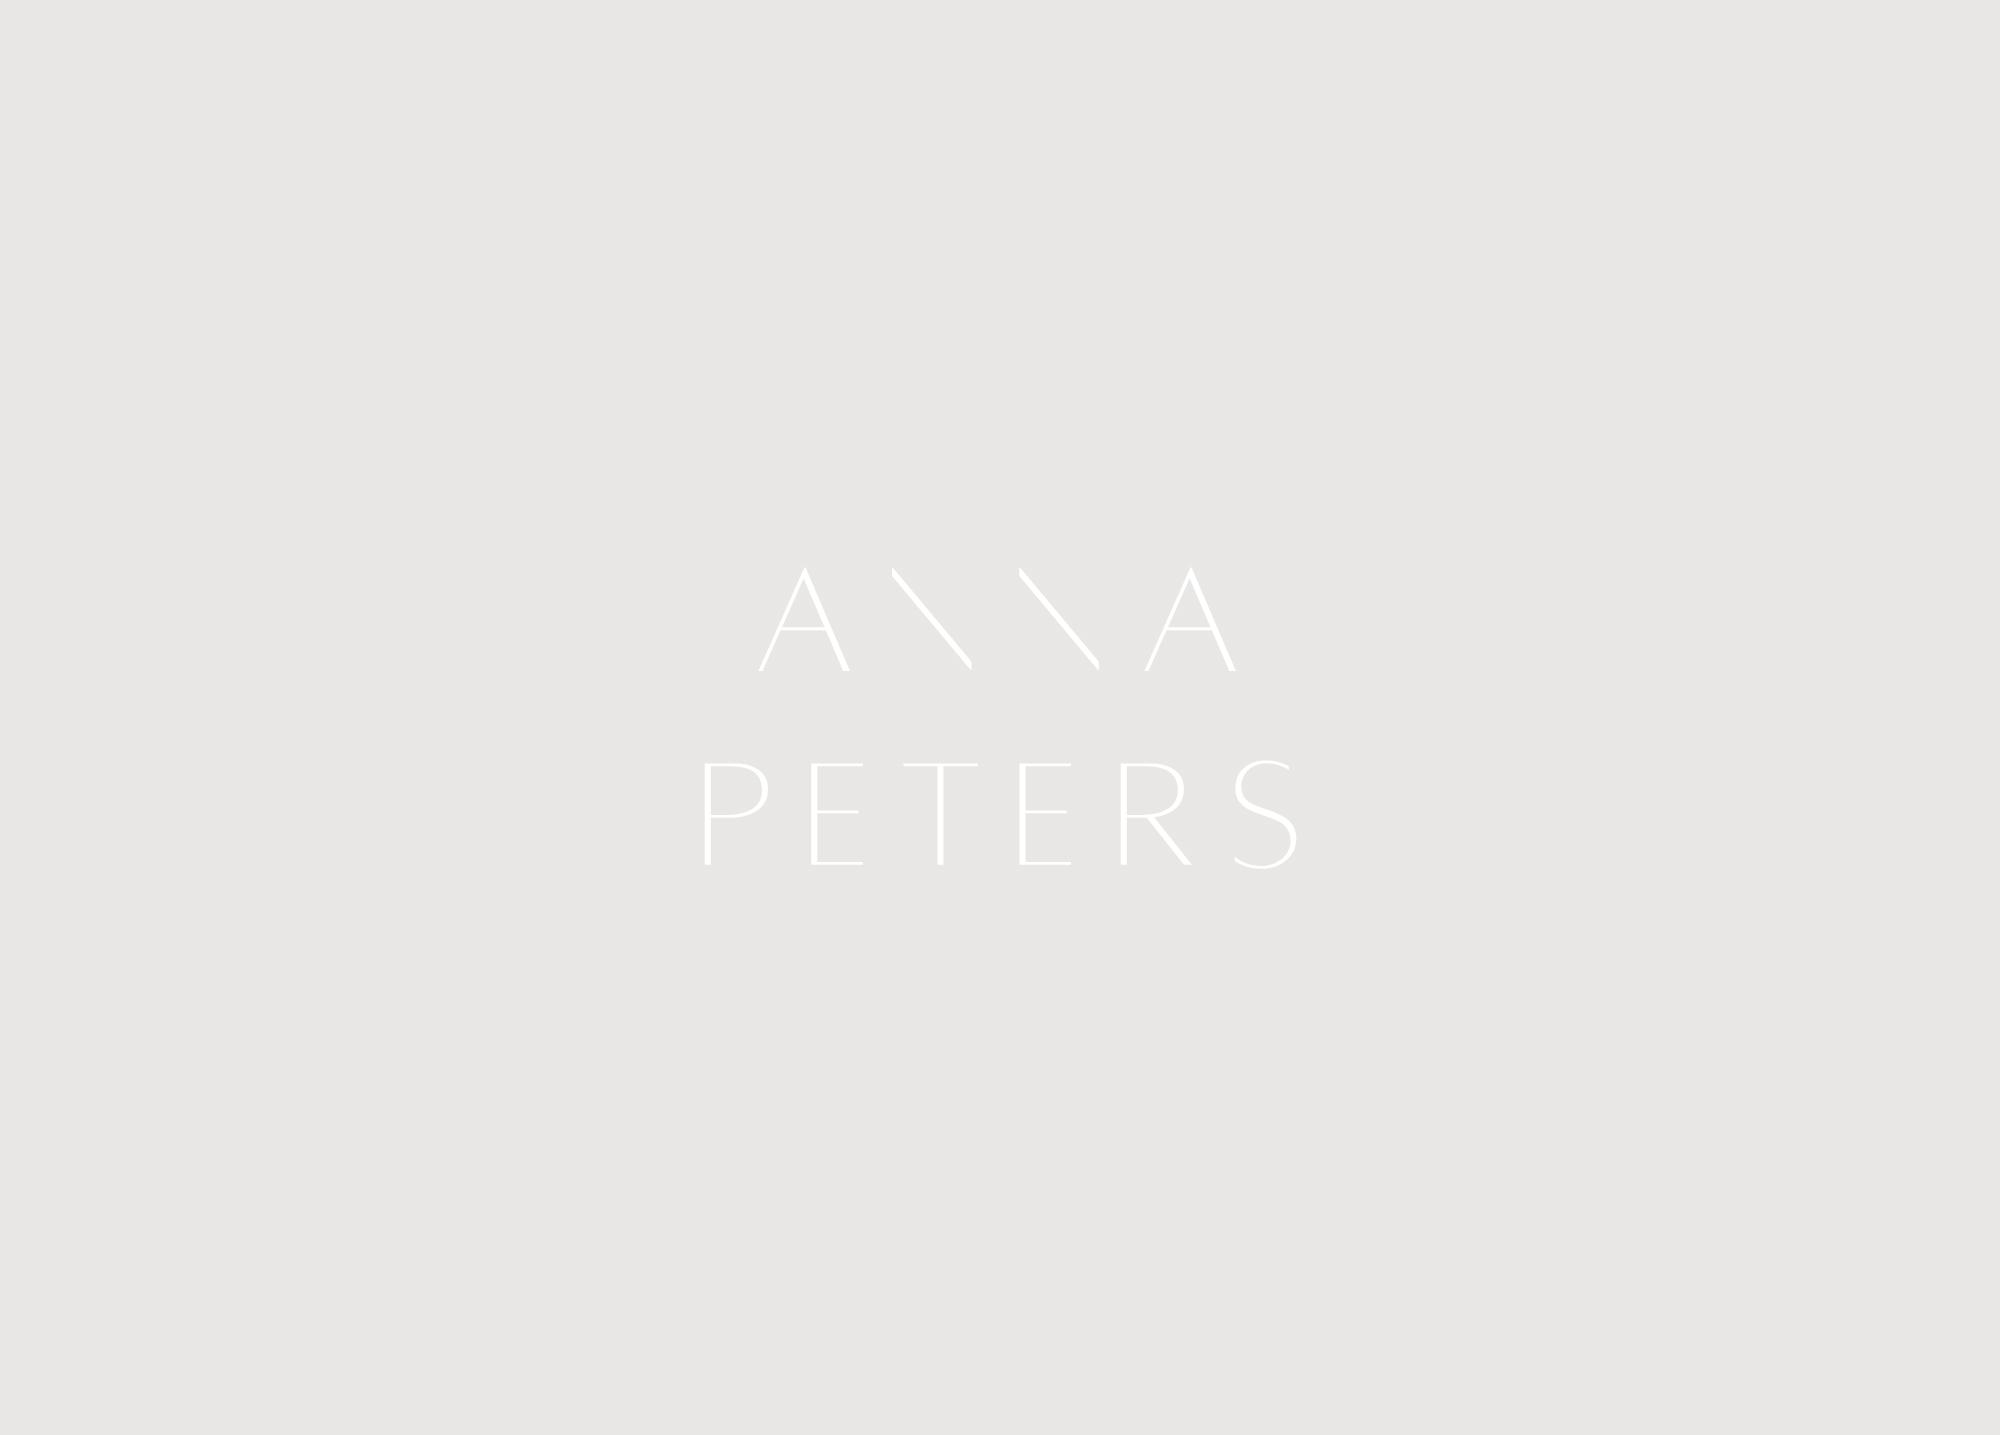 AnnaPetersLogo3.jpg